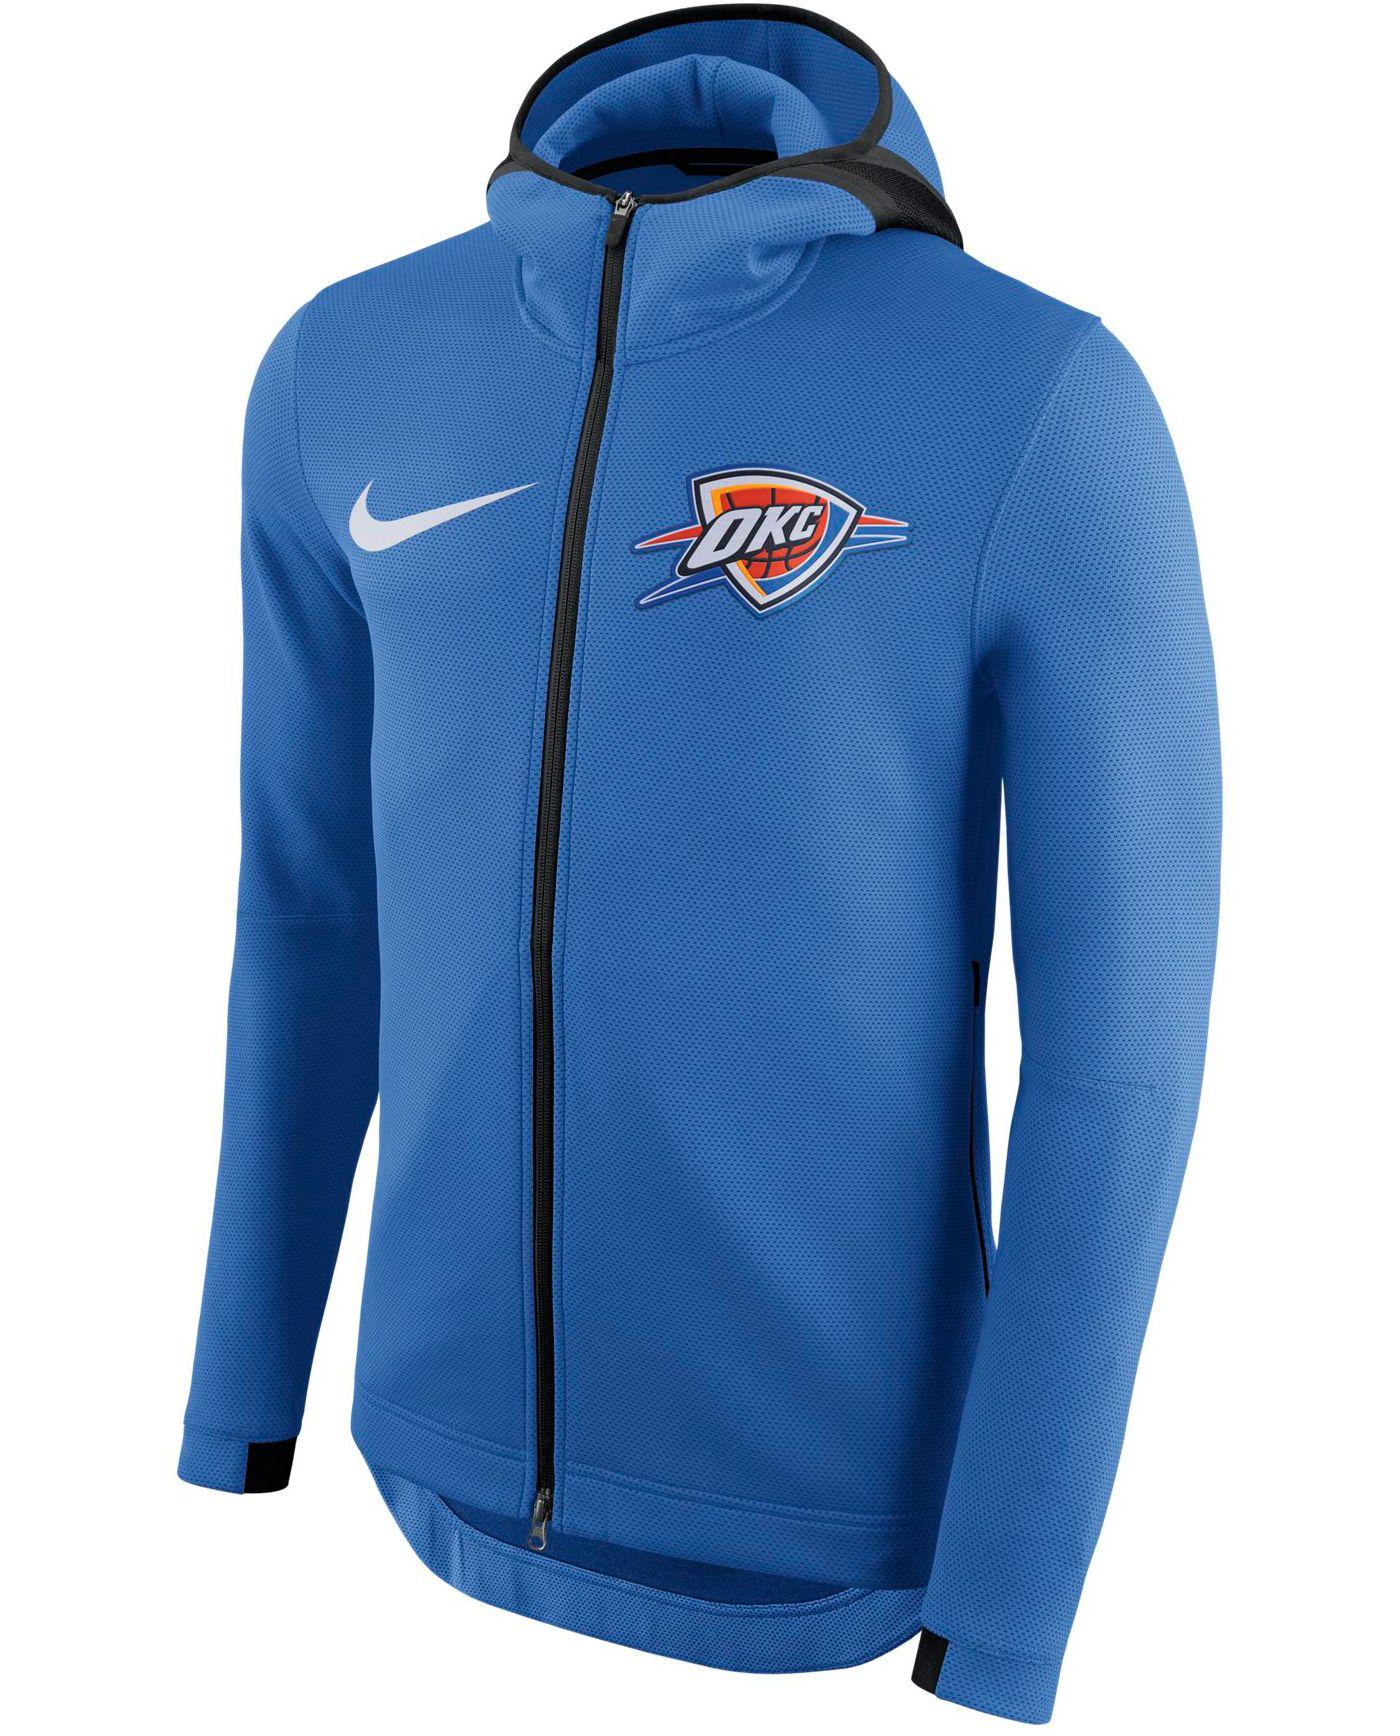 Nike Men's Oklahoma City Thunder On-Court Therma Flex Showtime Full-Zip Hoodie